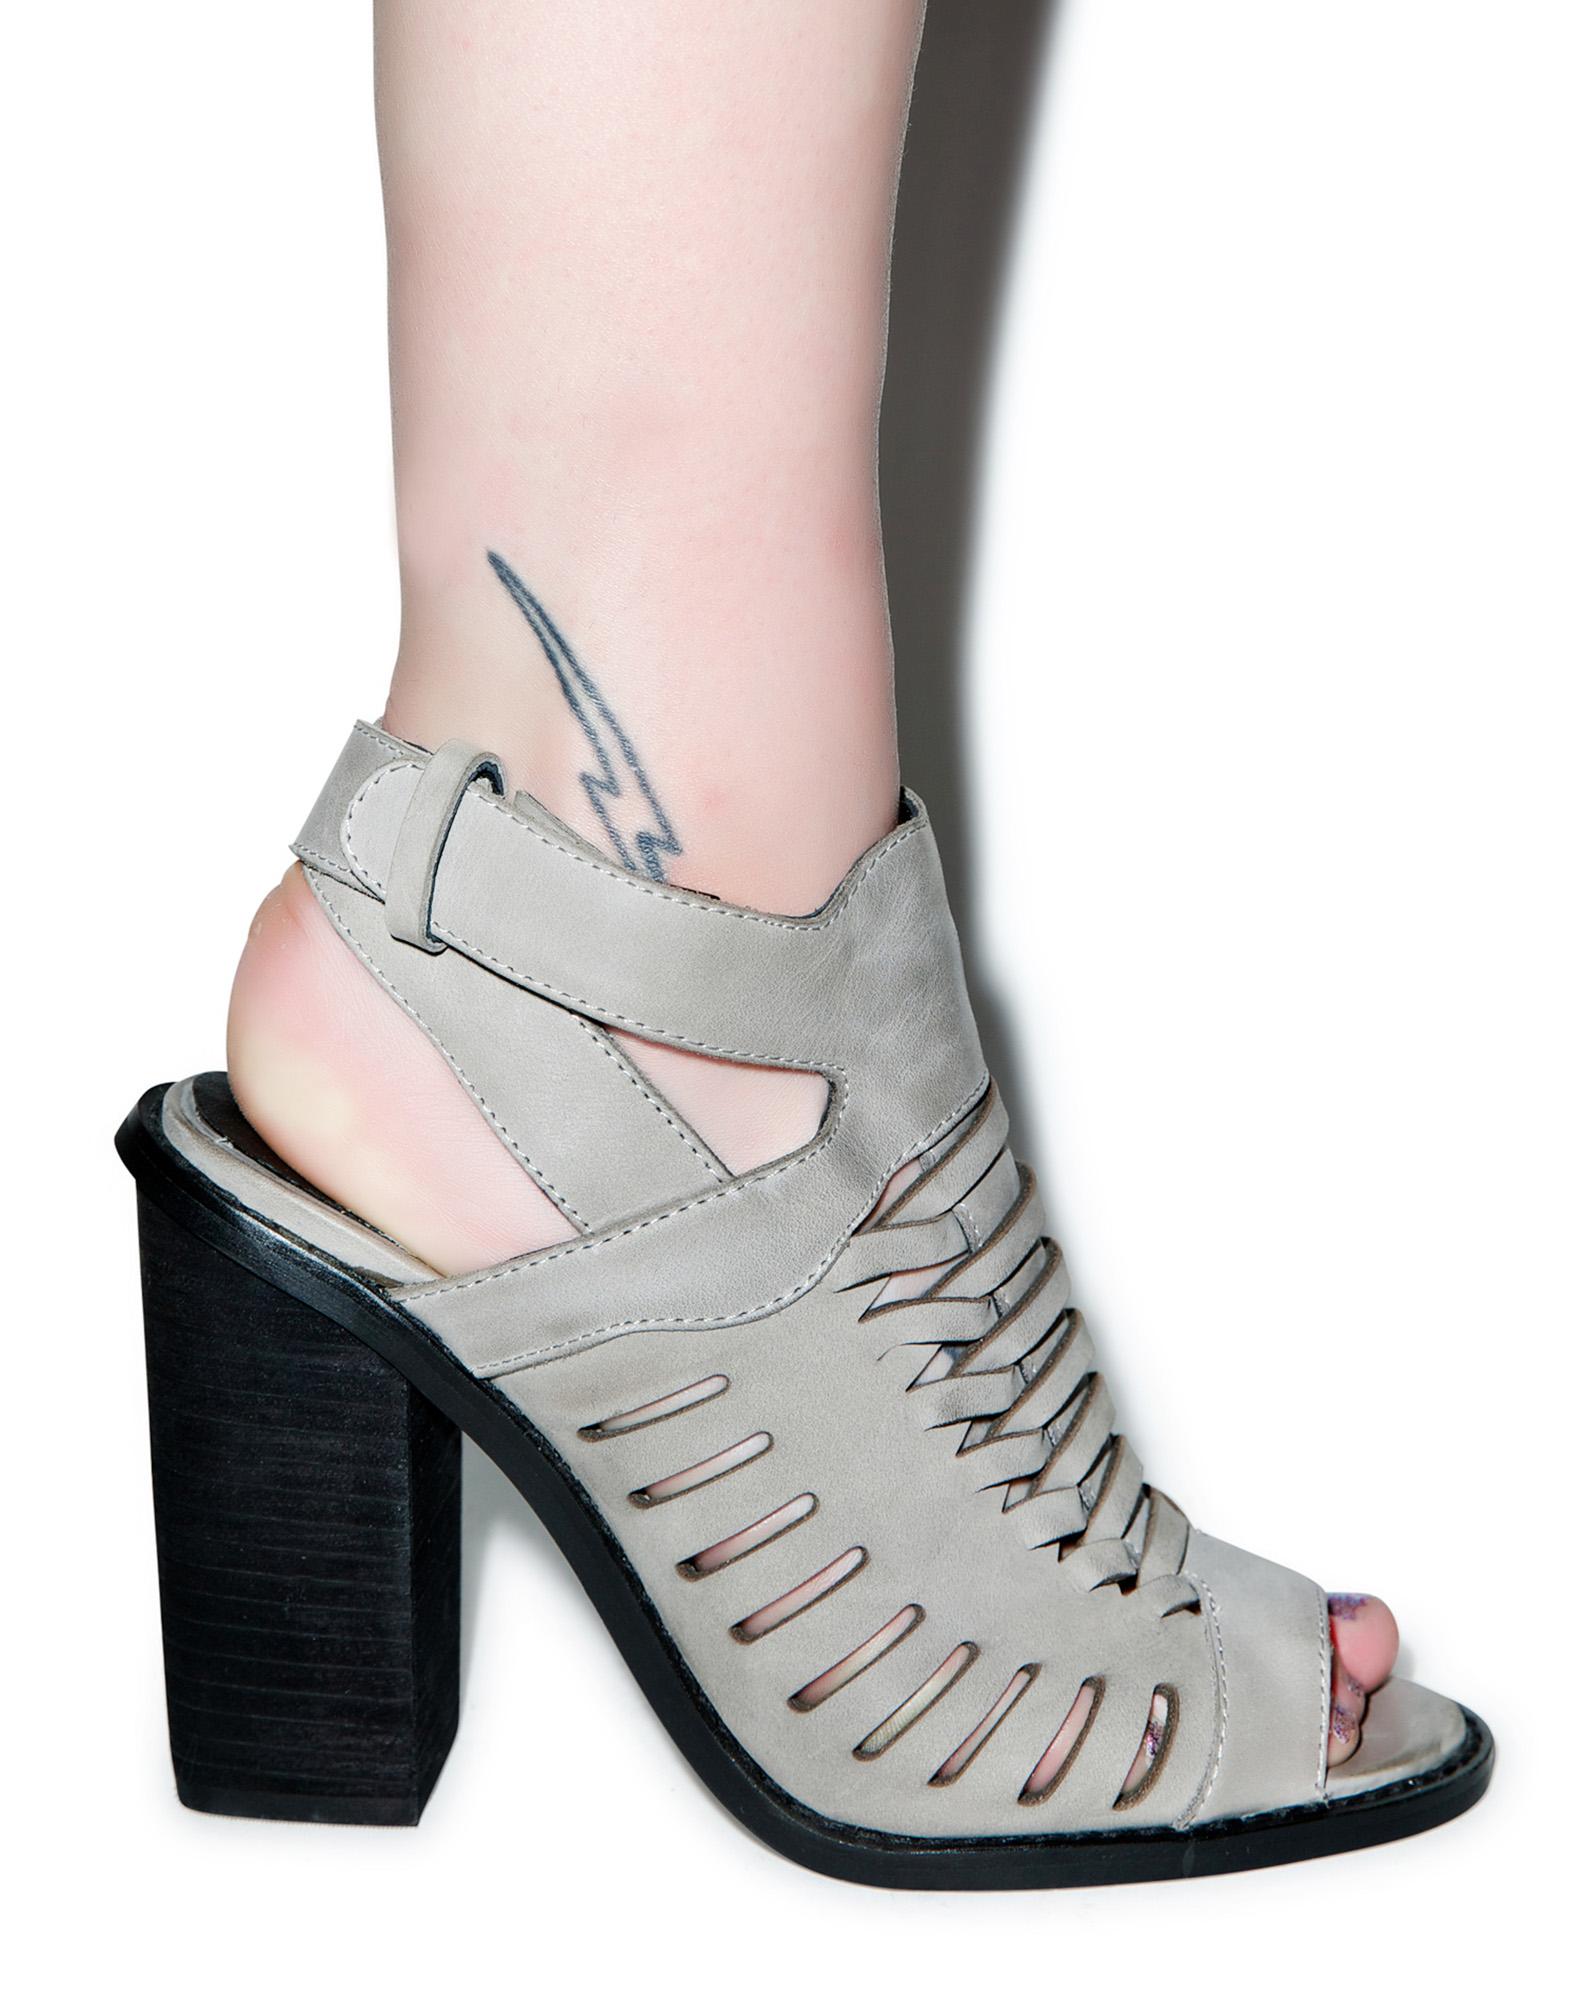 Intentionally Blank Turbo Heels